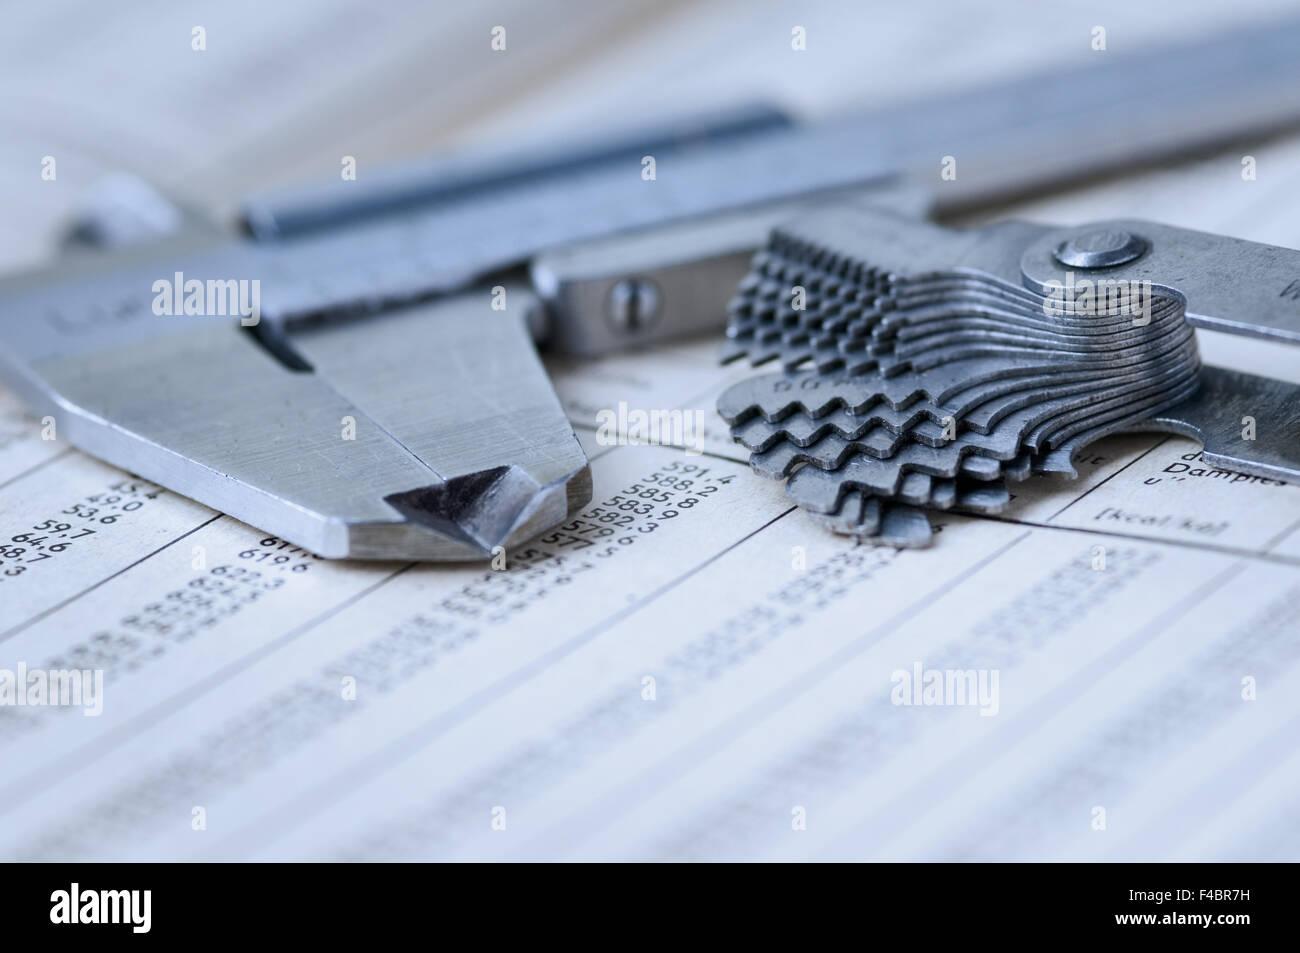 vernier caliper and gauge on chart - Stock Image